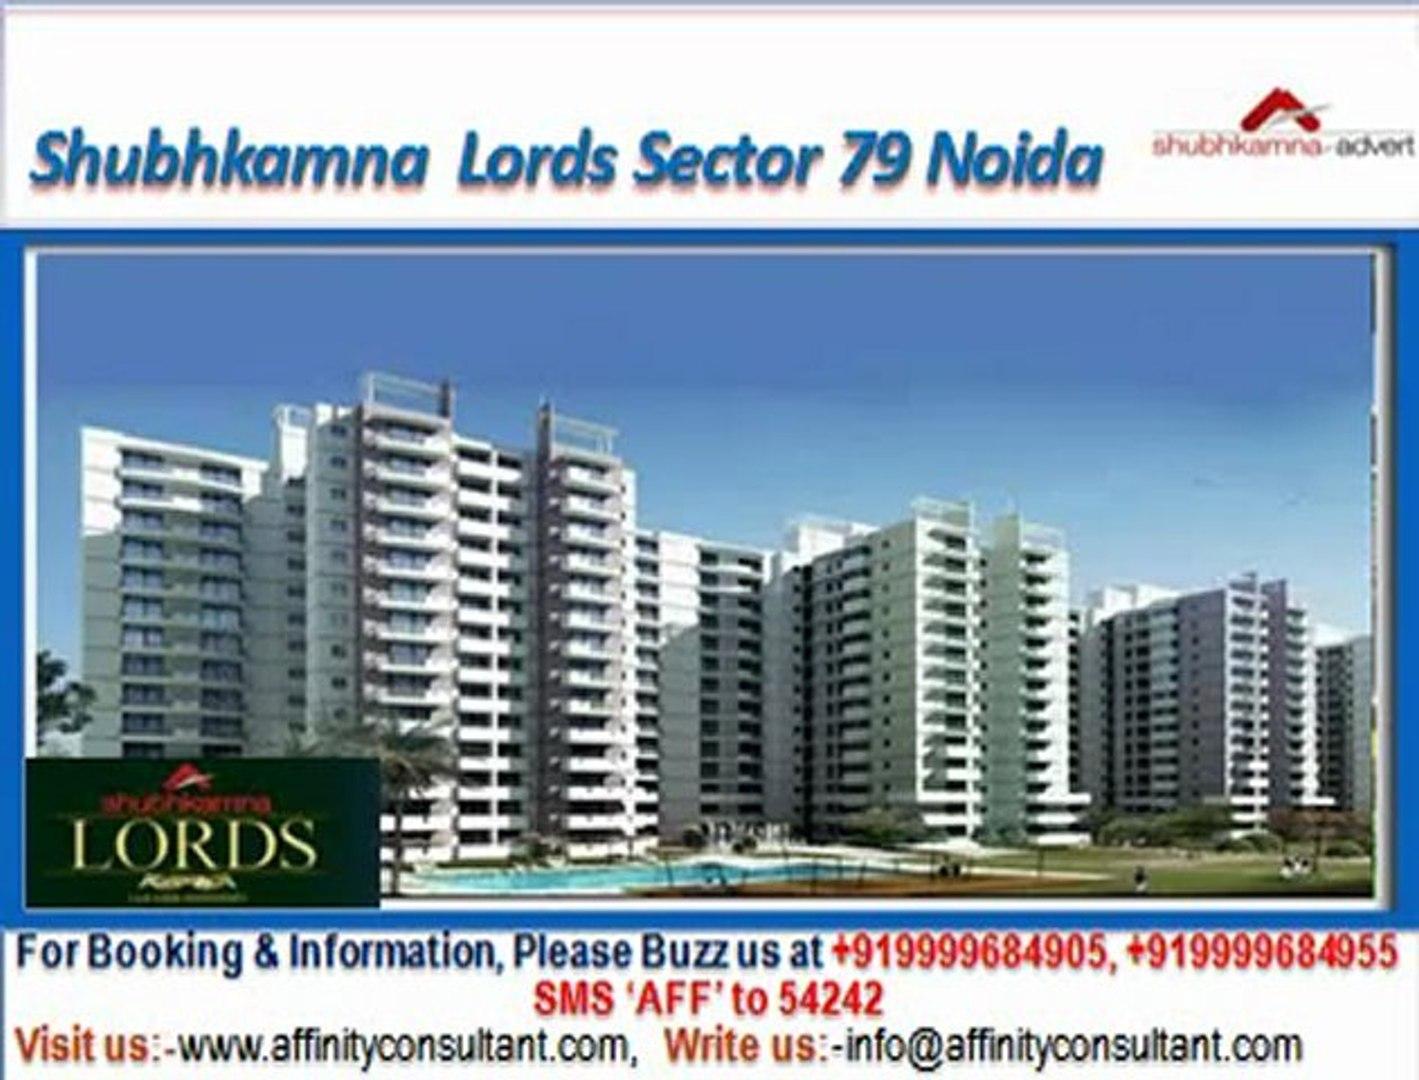 Shubhkamna Lords Apartments Sector 79 Noida @ 09999684905